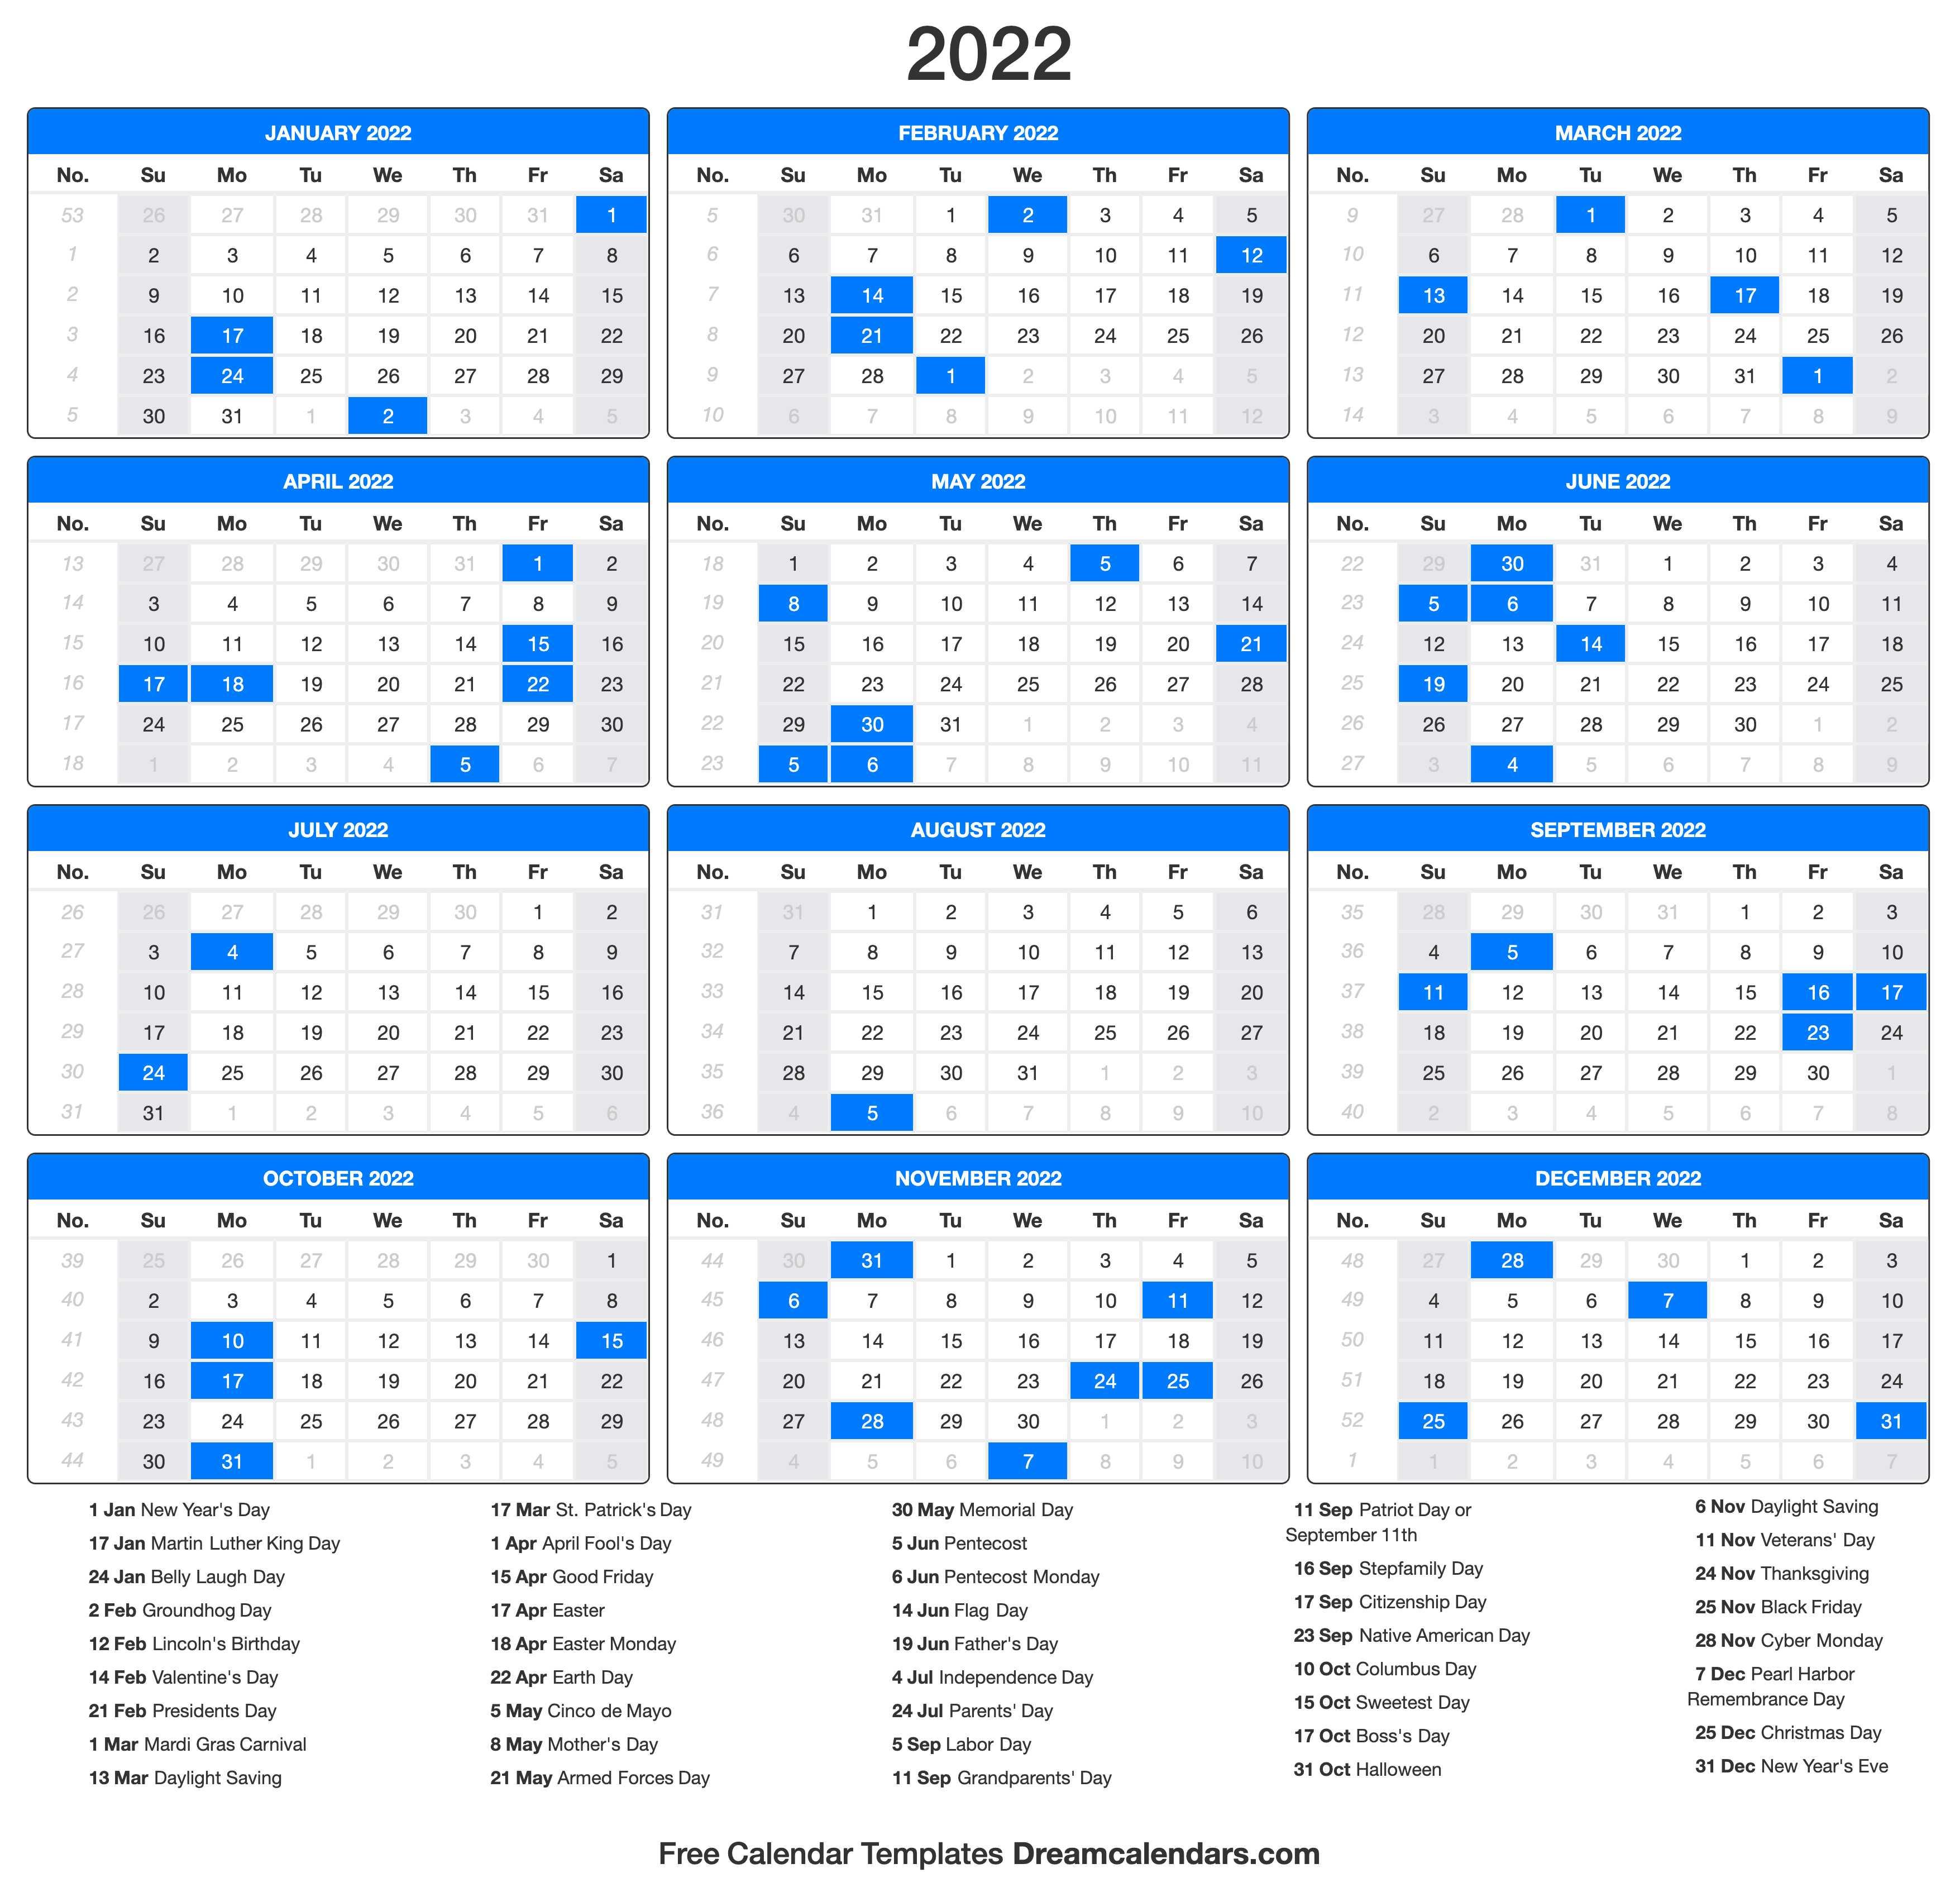 Moon Calendar February 2022.2022 Calendar